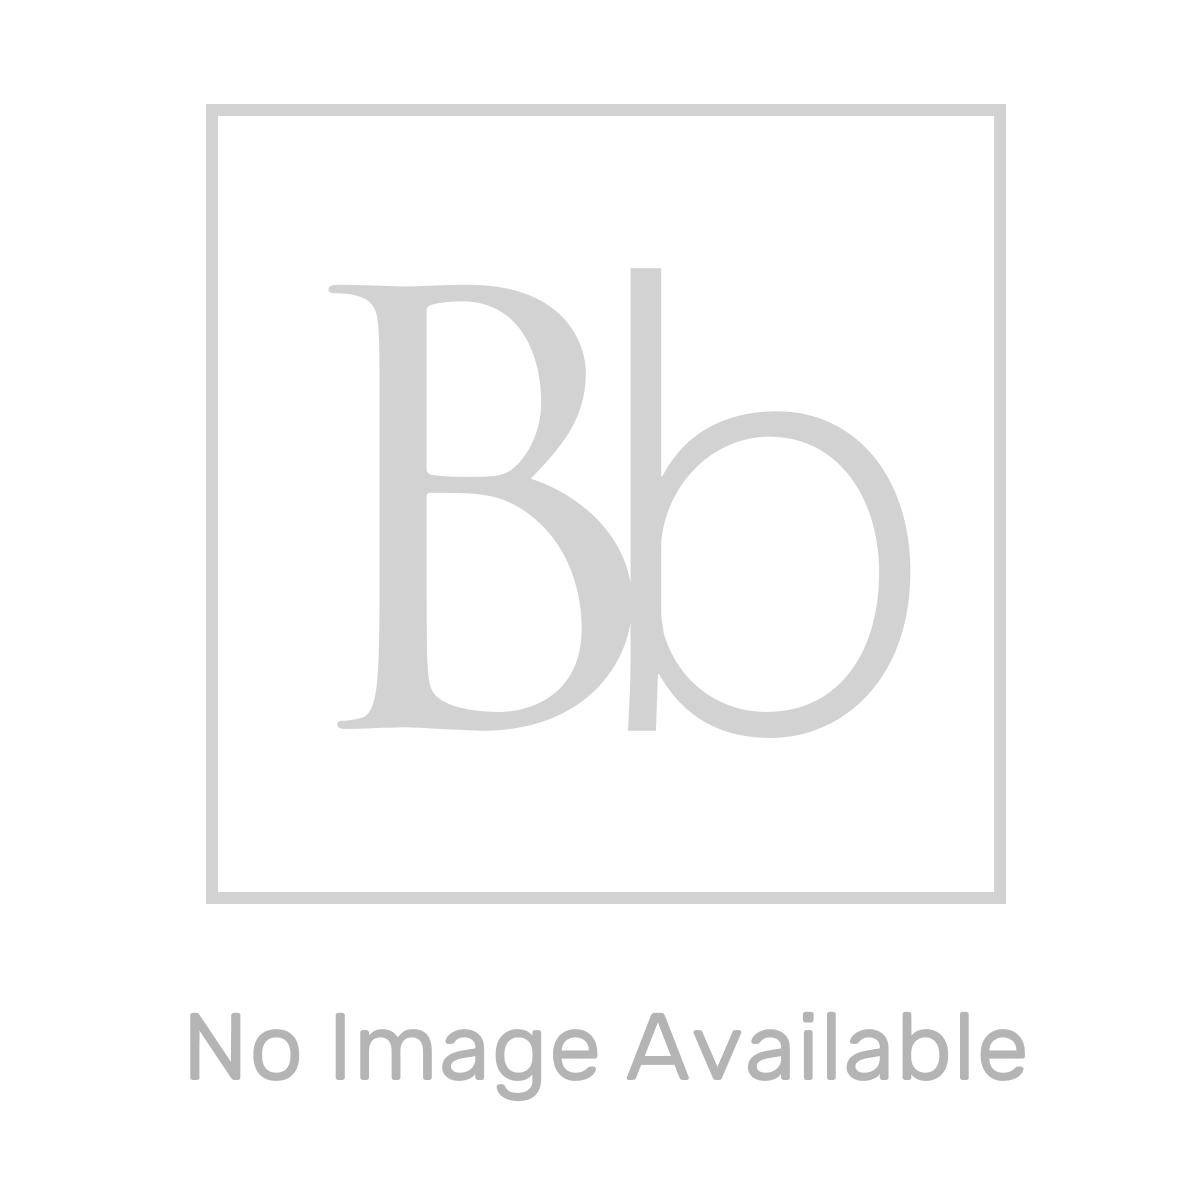 RAK Washington Toilet Brush with Holder Measurements